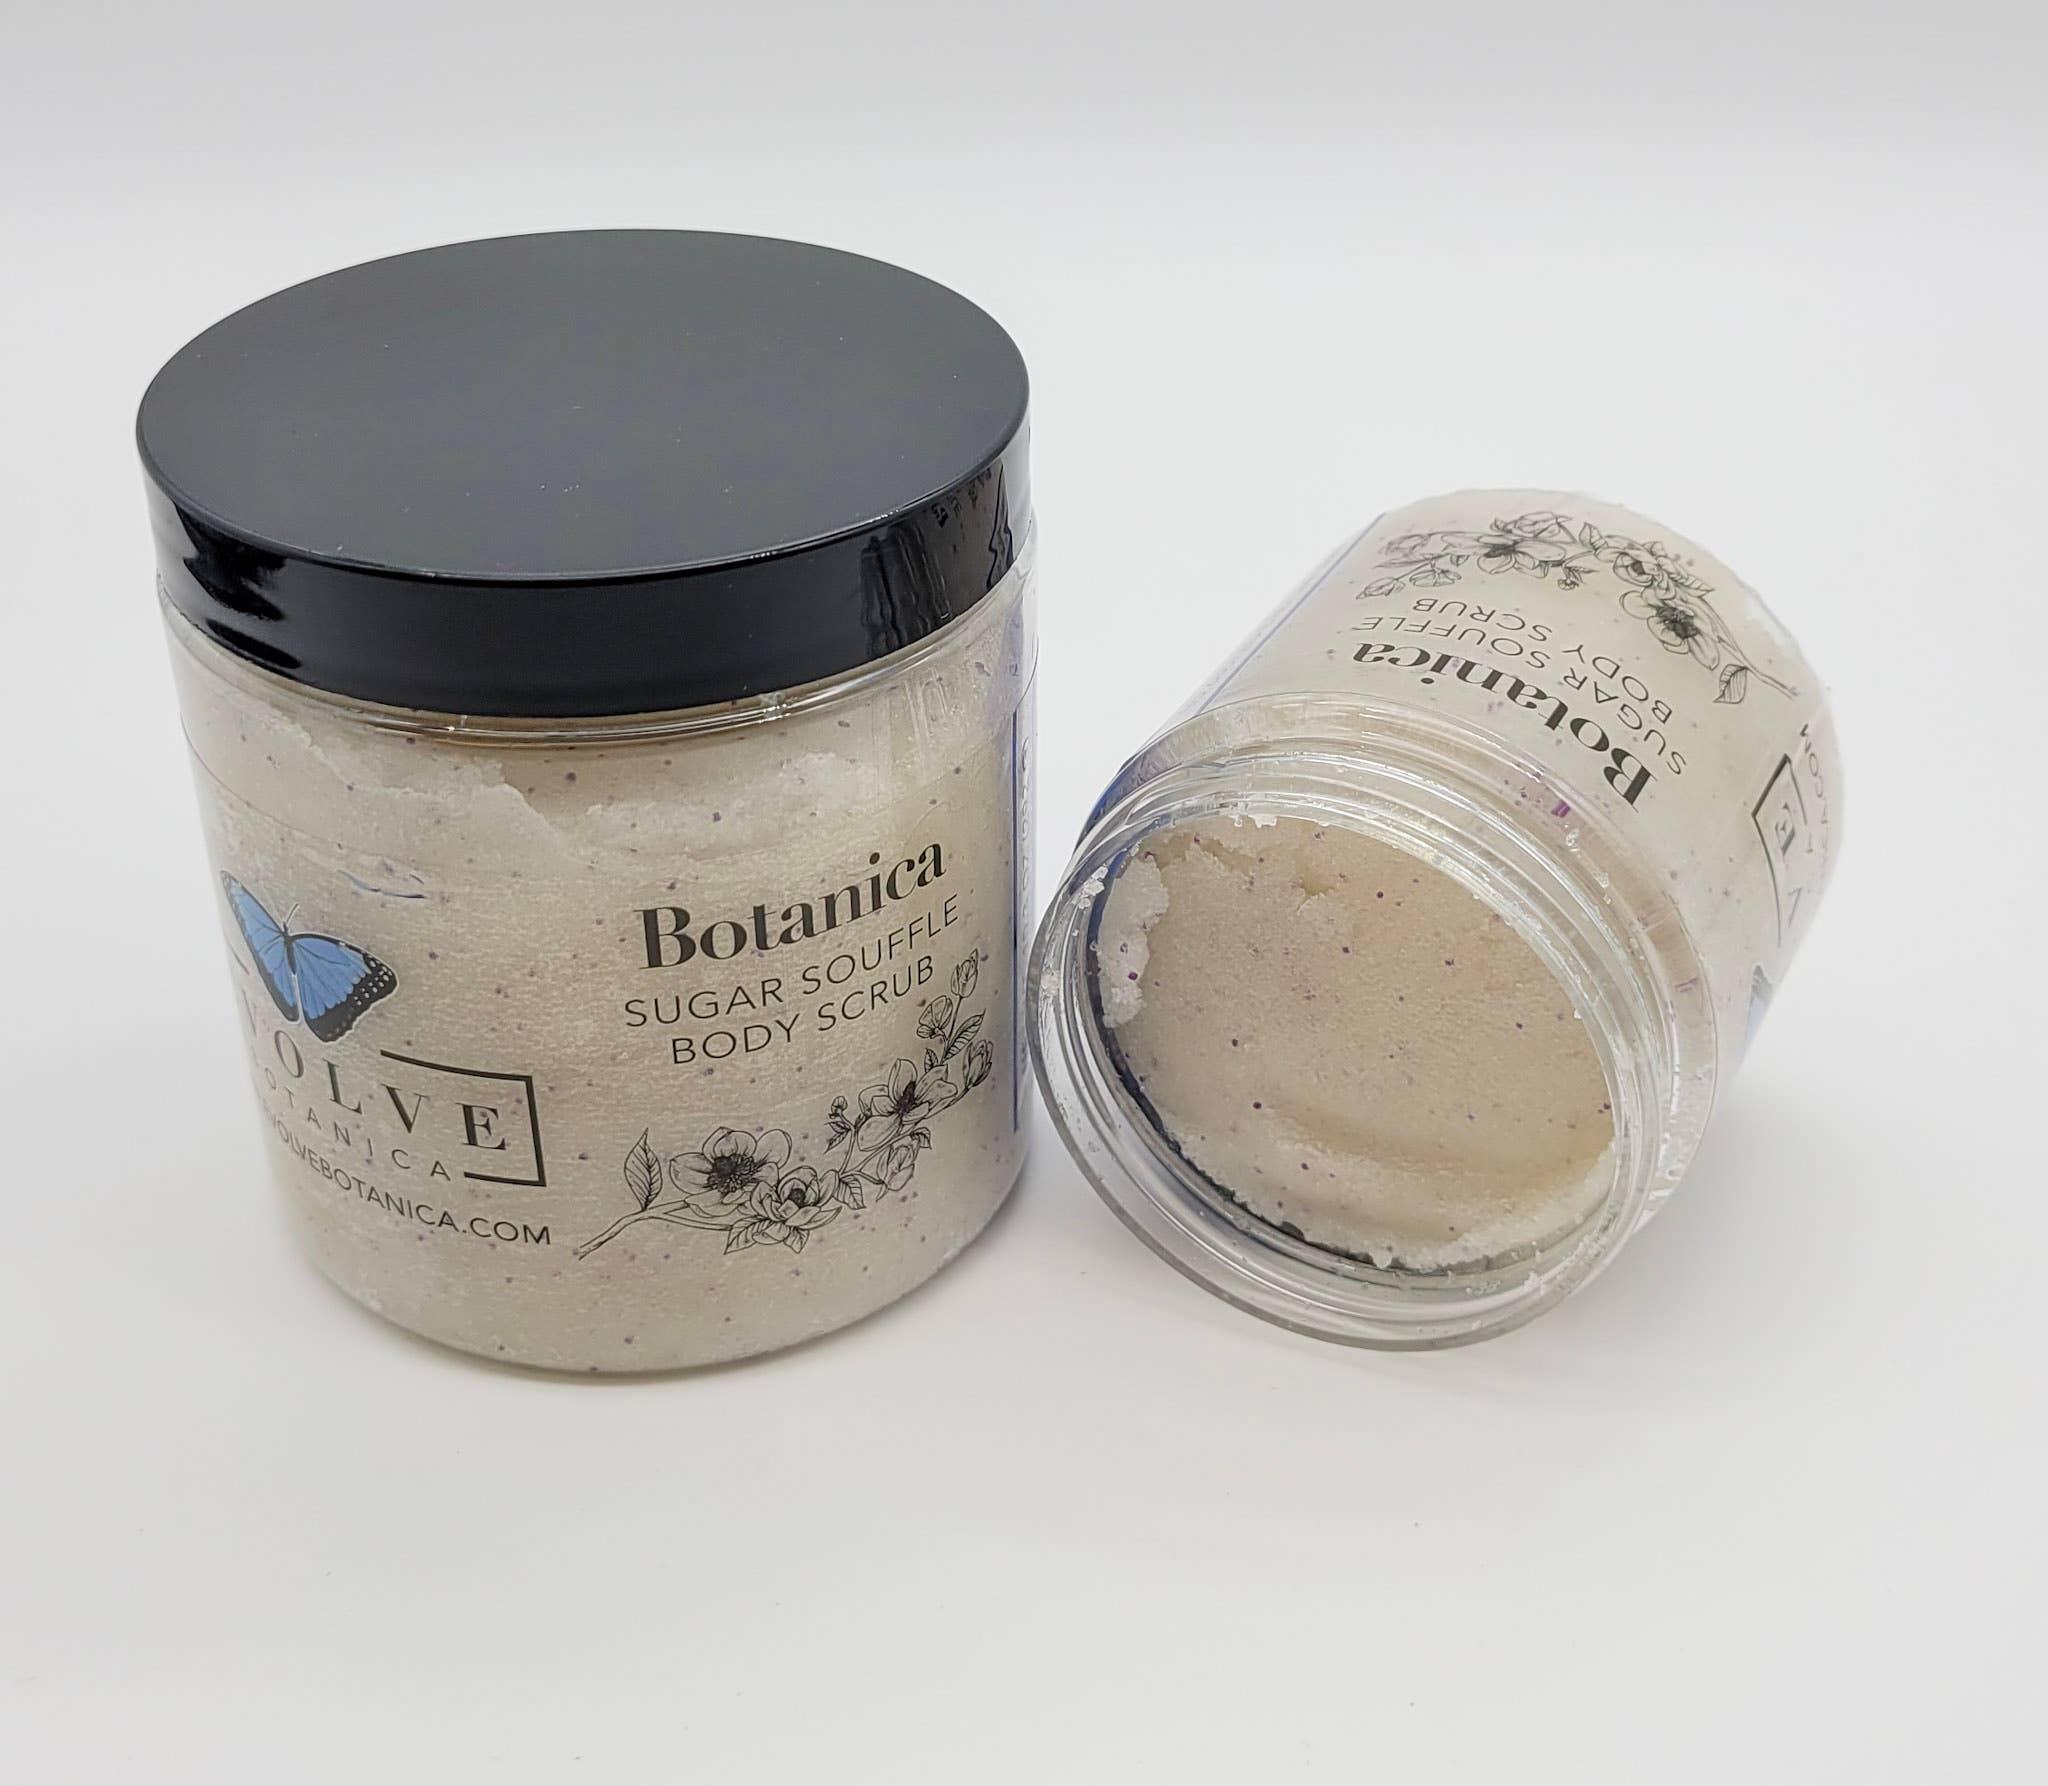 Evolve - Skincare - Sugar Souffle Body Polish - Botanica (Lg | Trada Marketplace